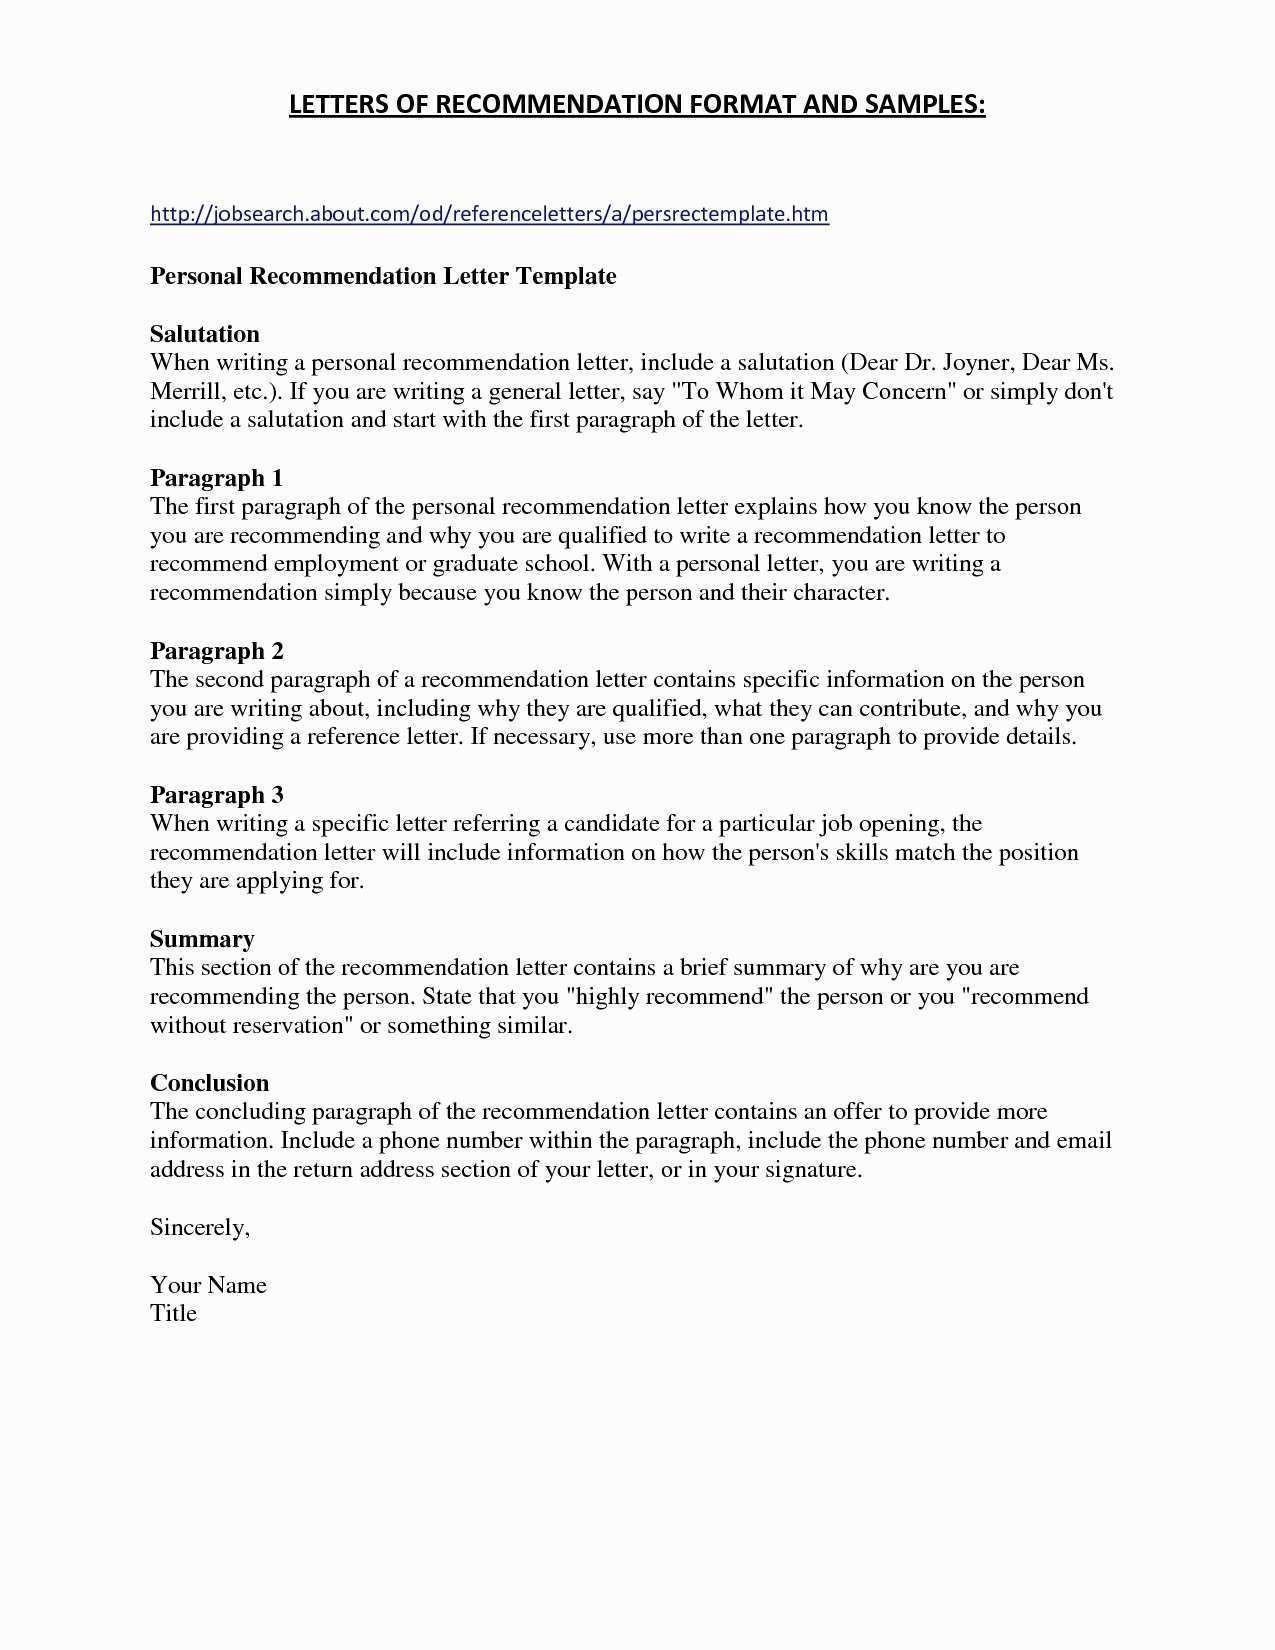 Credit Dispute Letter Template Pdf - Job Re Mendation Letter Template New Dispute Letter to Credit